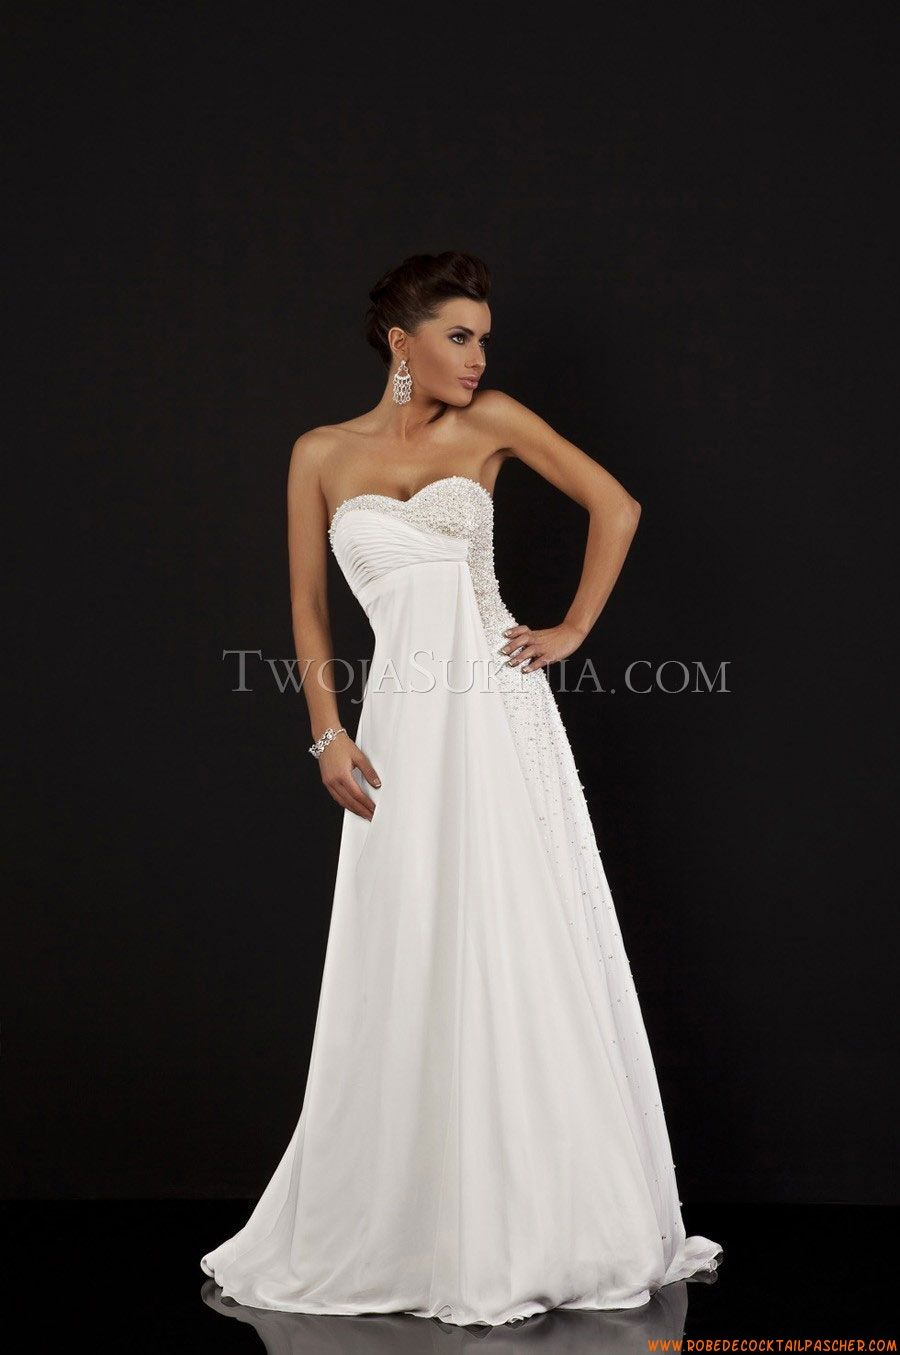 Robe de mariée Relevance Bridal Lindsay Charming Simplicity